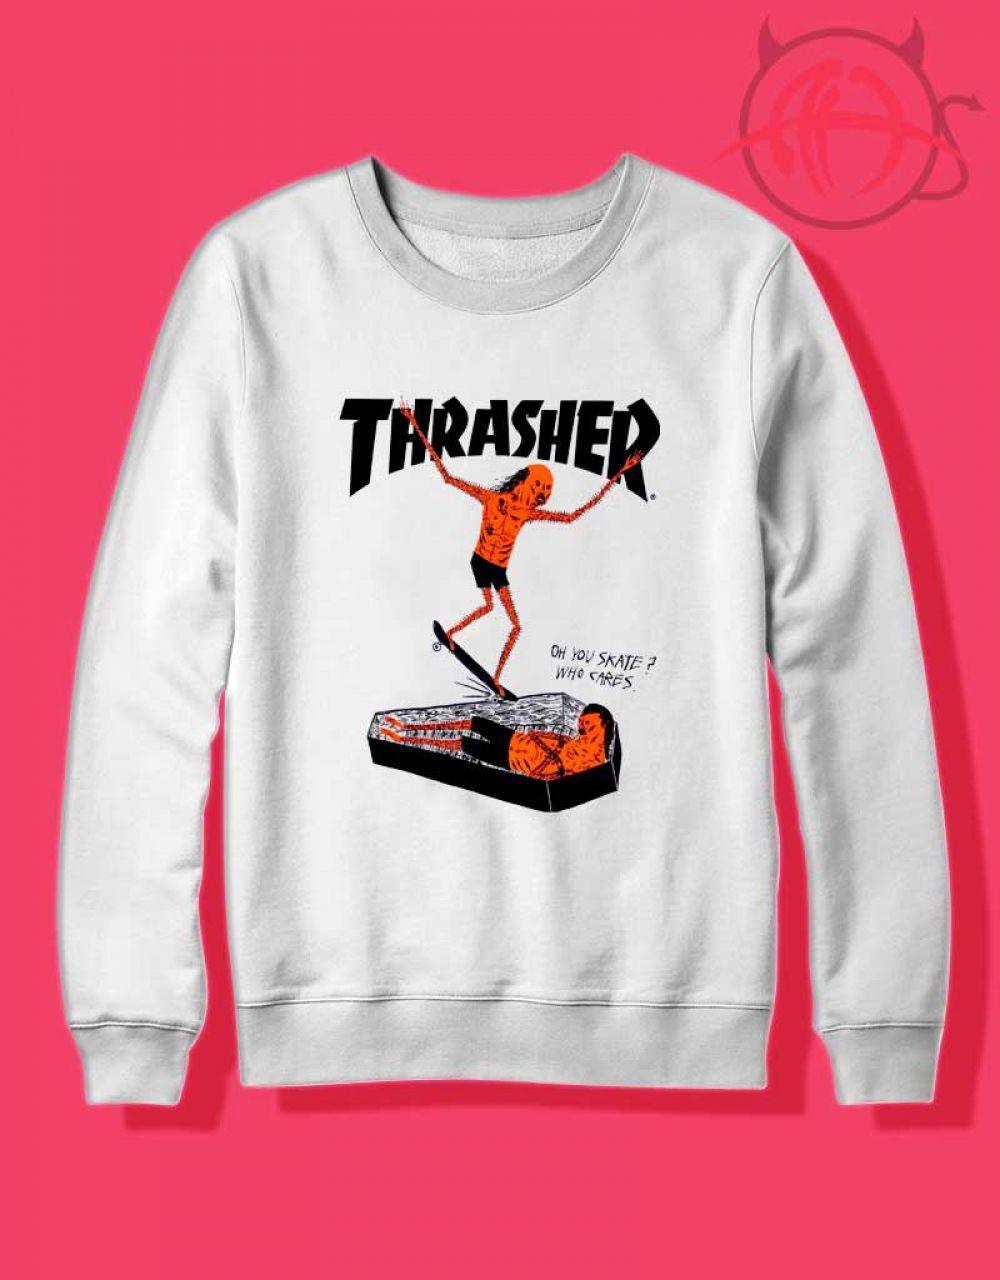 Thrasher Neck Face Crewneck Sweatshirt Size S M L Xl 2xl Ahawking Com Graphic Crewneck Sweatshirt Crew Neck Sweatshirt Sweatshirts [ 1280 x 1000 Pixel ]